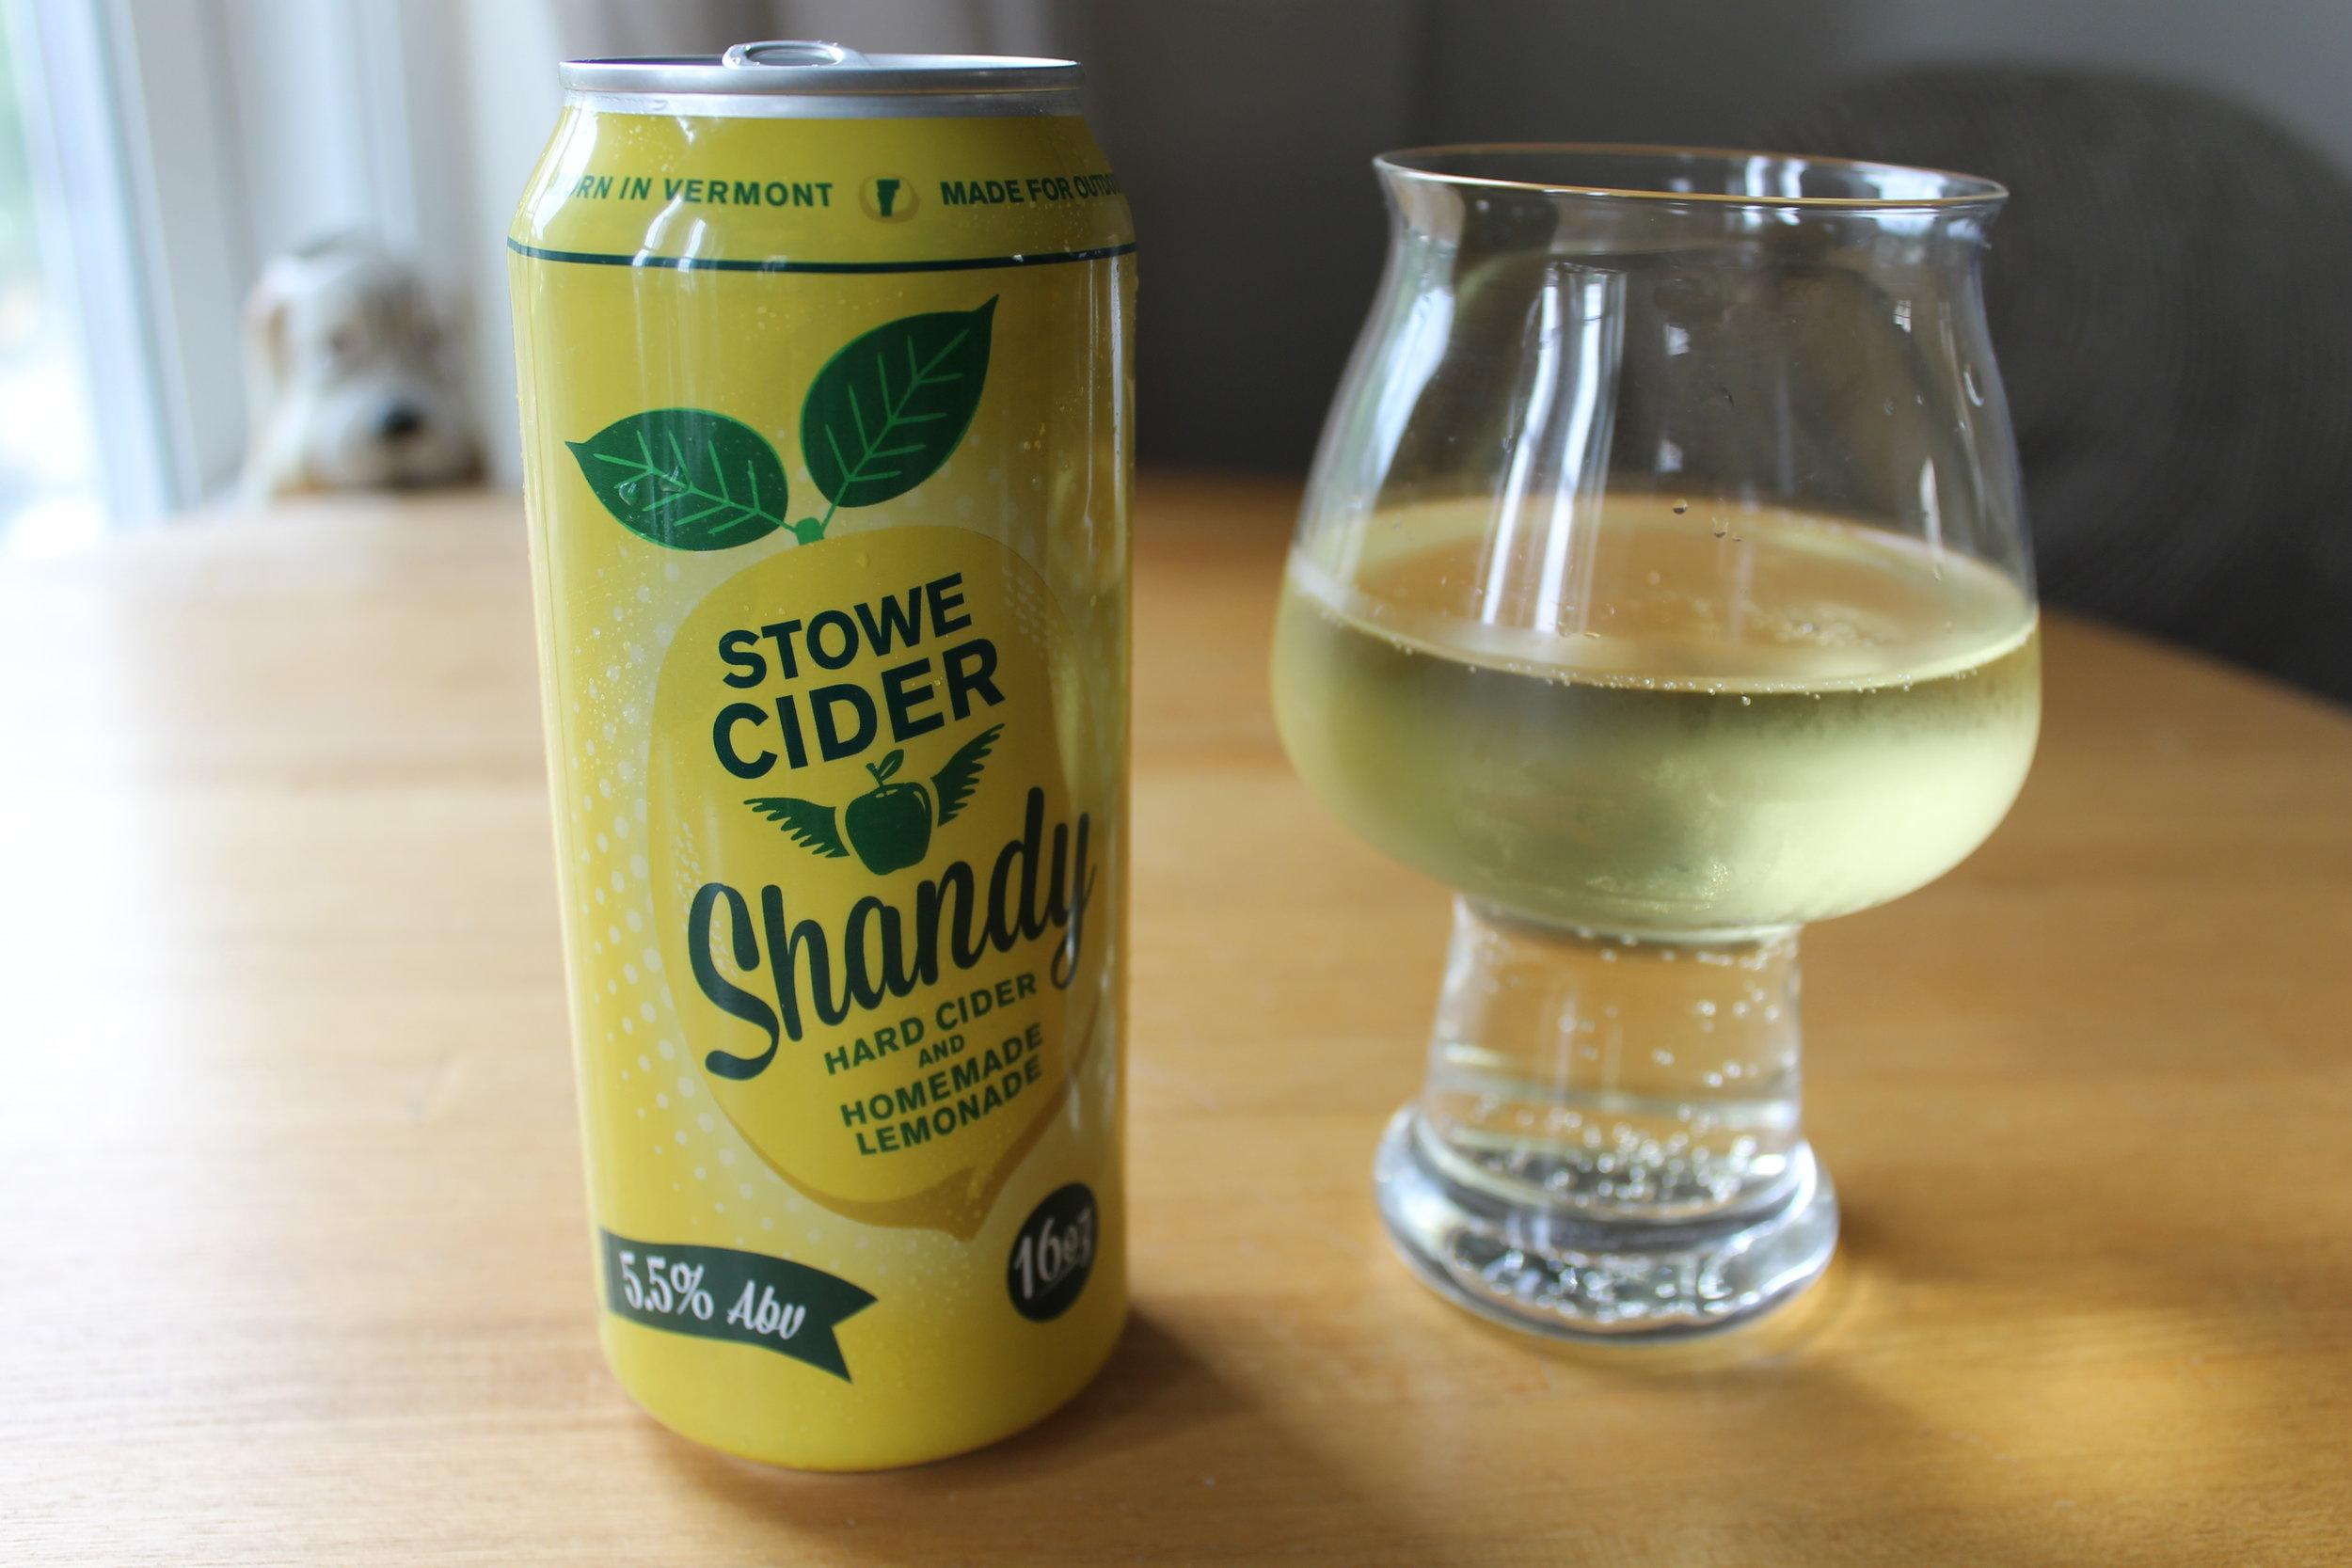 Stowe Cider: Shandy